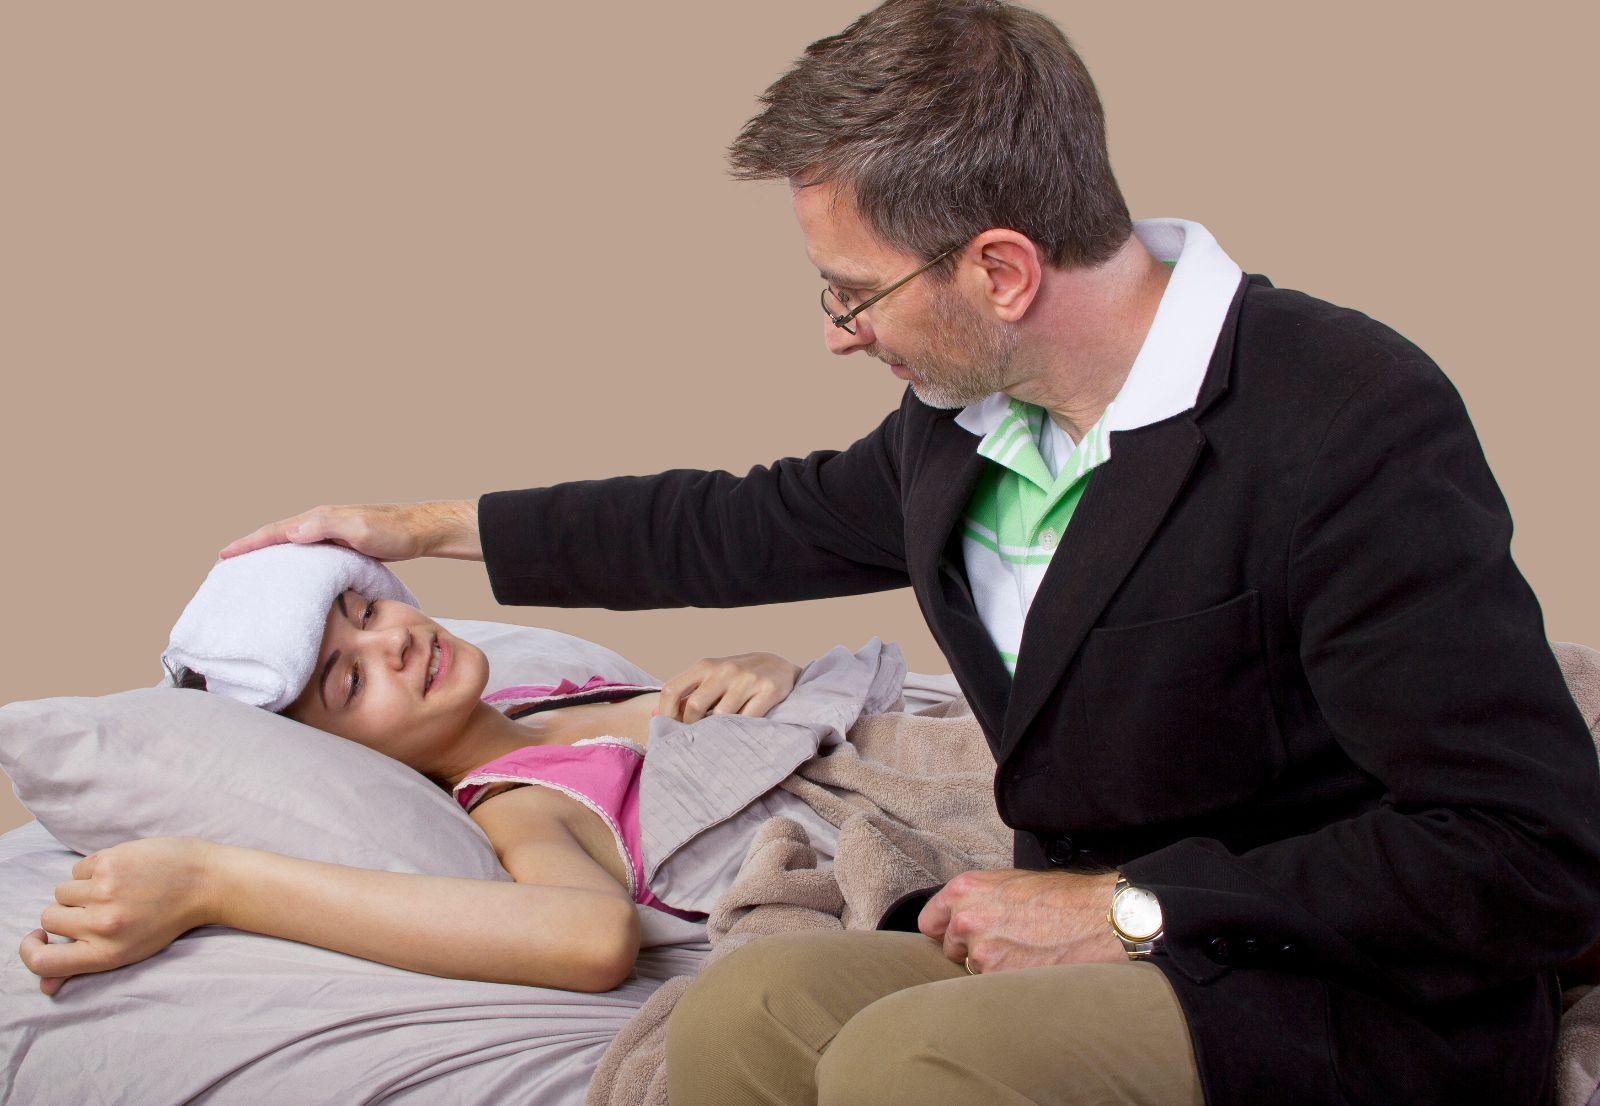 Padre cuidando a su h